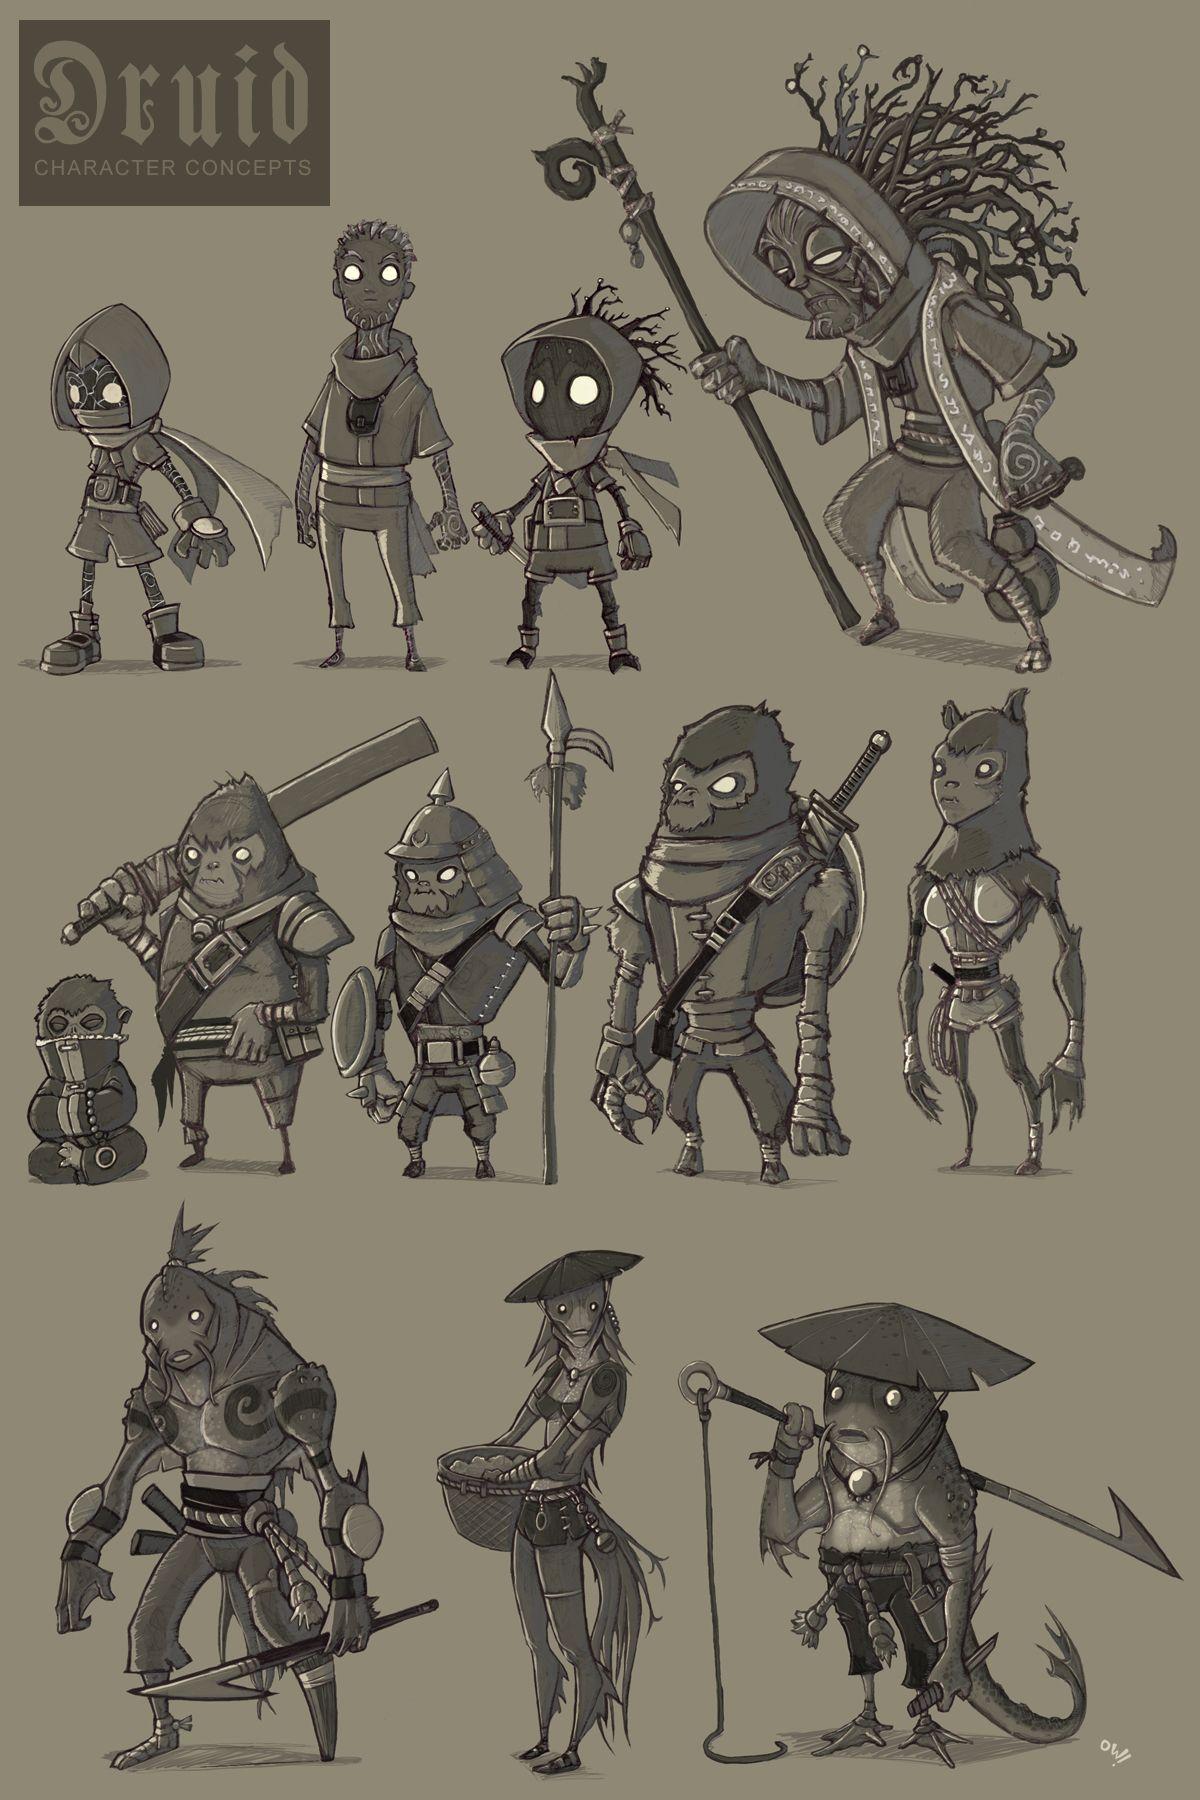 Cartoon Character Design Concept : Druid character concepts by elbrazo viantart on